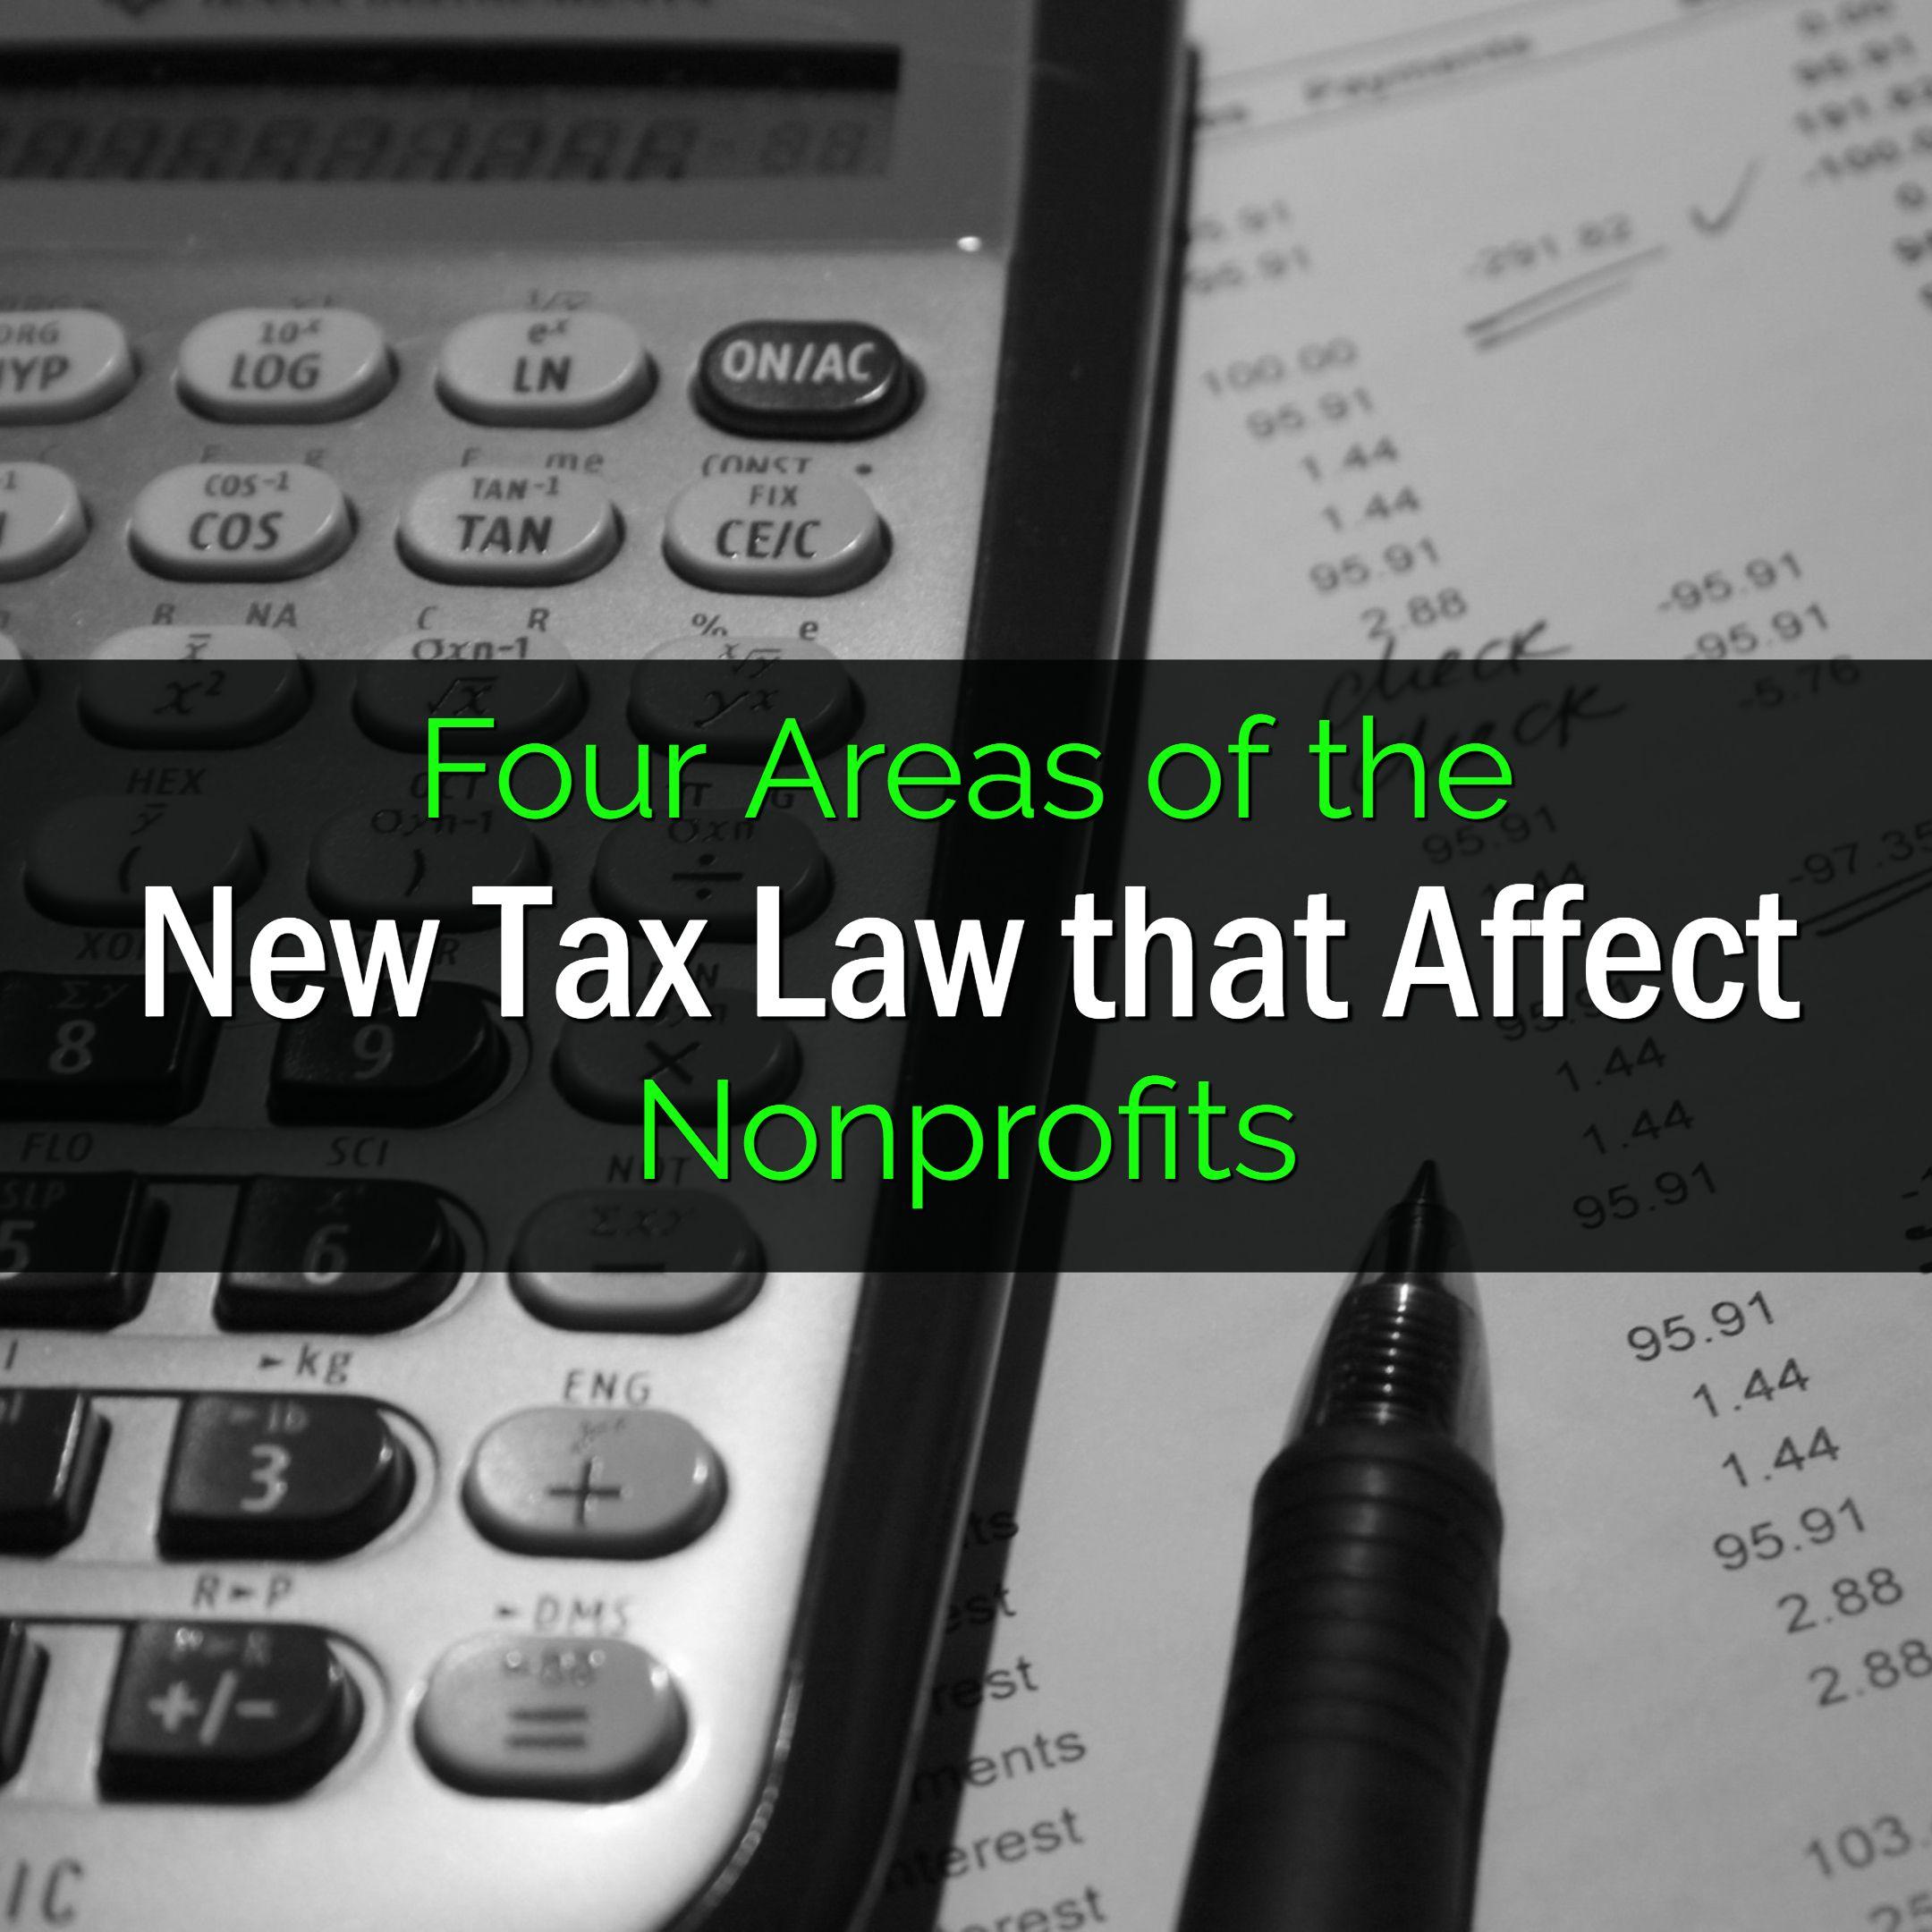 new tax law that affect nonprofits nonprofit taxes nonprofit